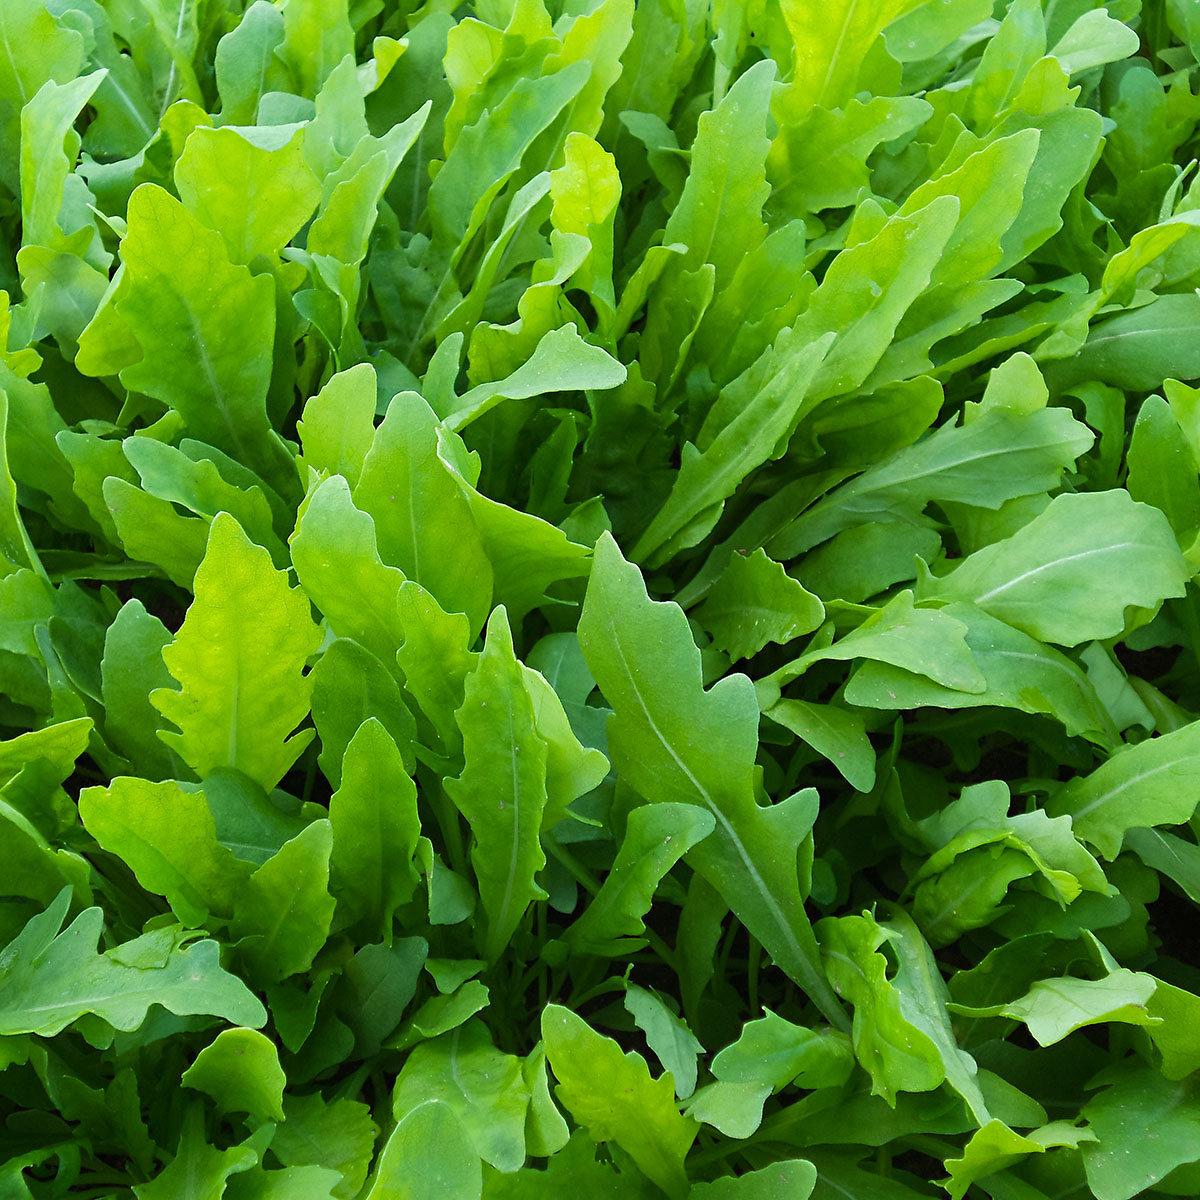 Saatgut-Holzbox Salatvielfalt, 7 Saatgut-Sorten | #10